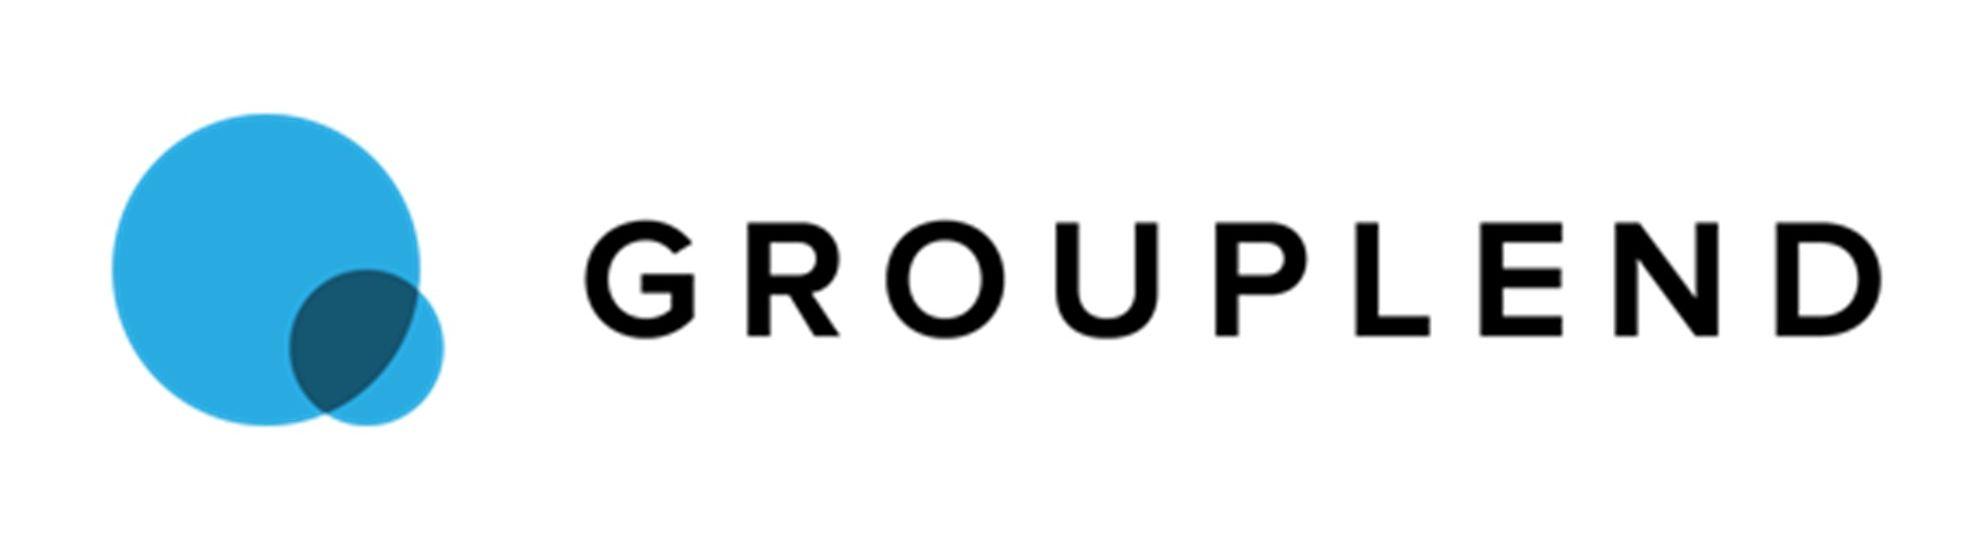 Grouplend